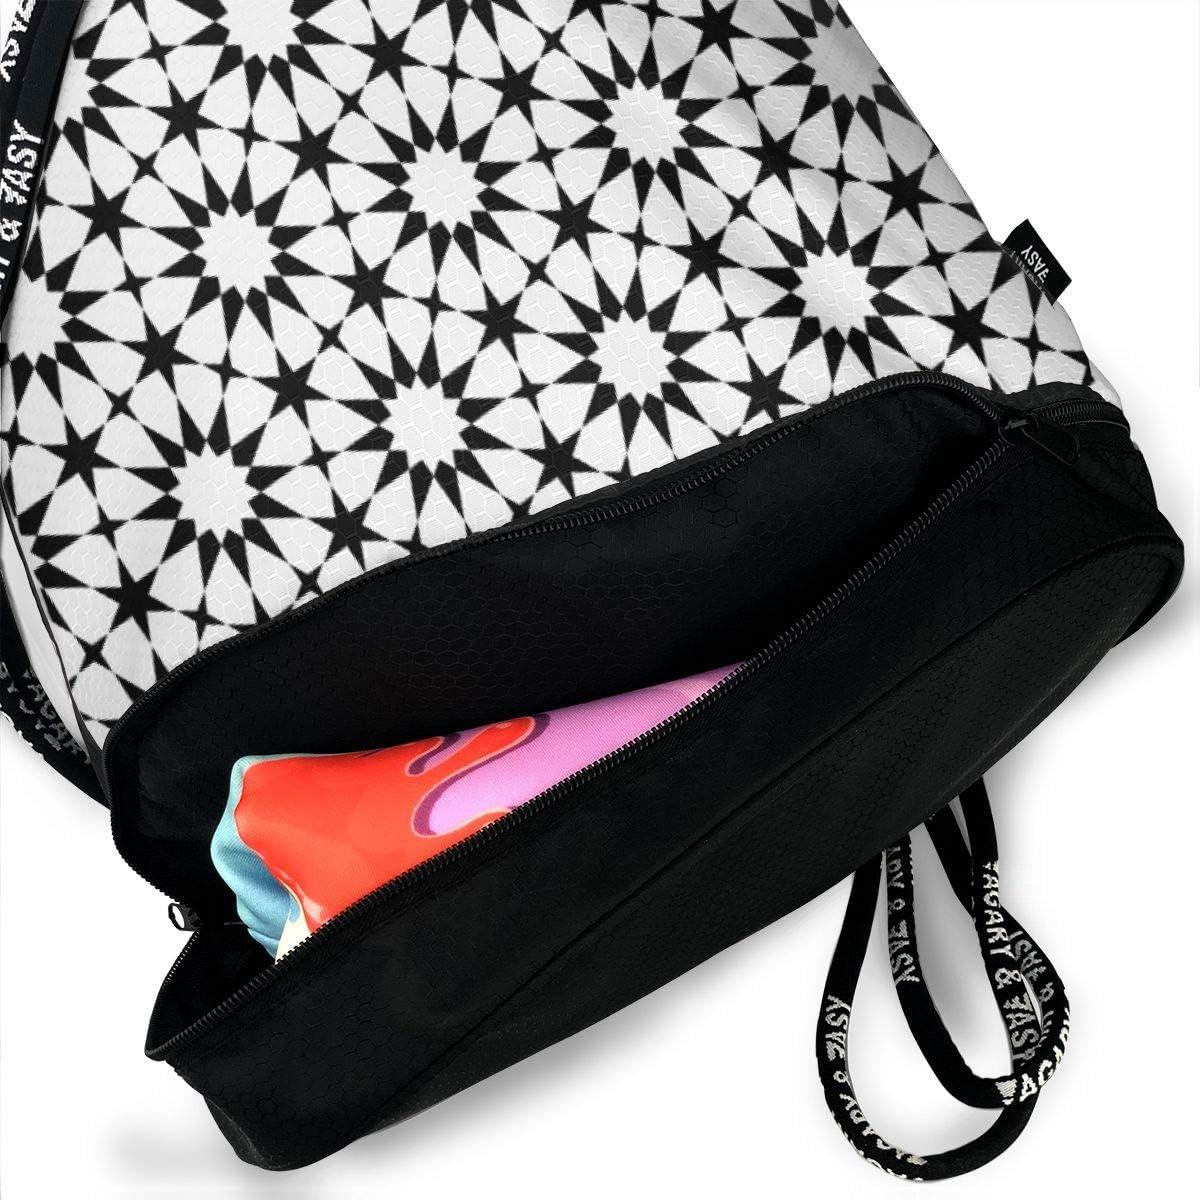 0 Sc64 E432 White Black Drawstring Backpack Sports Athletic Gym Cinch Sack String Storage Bags for Hiking Travel Beach